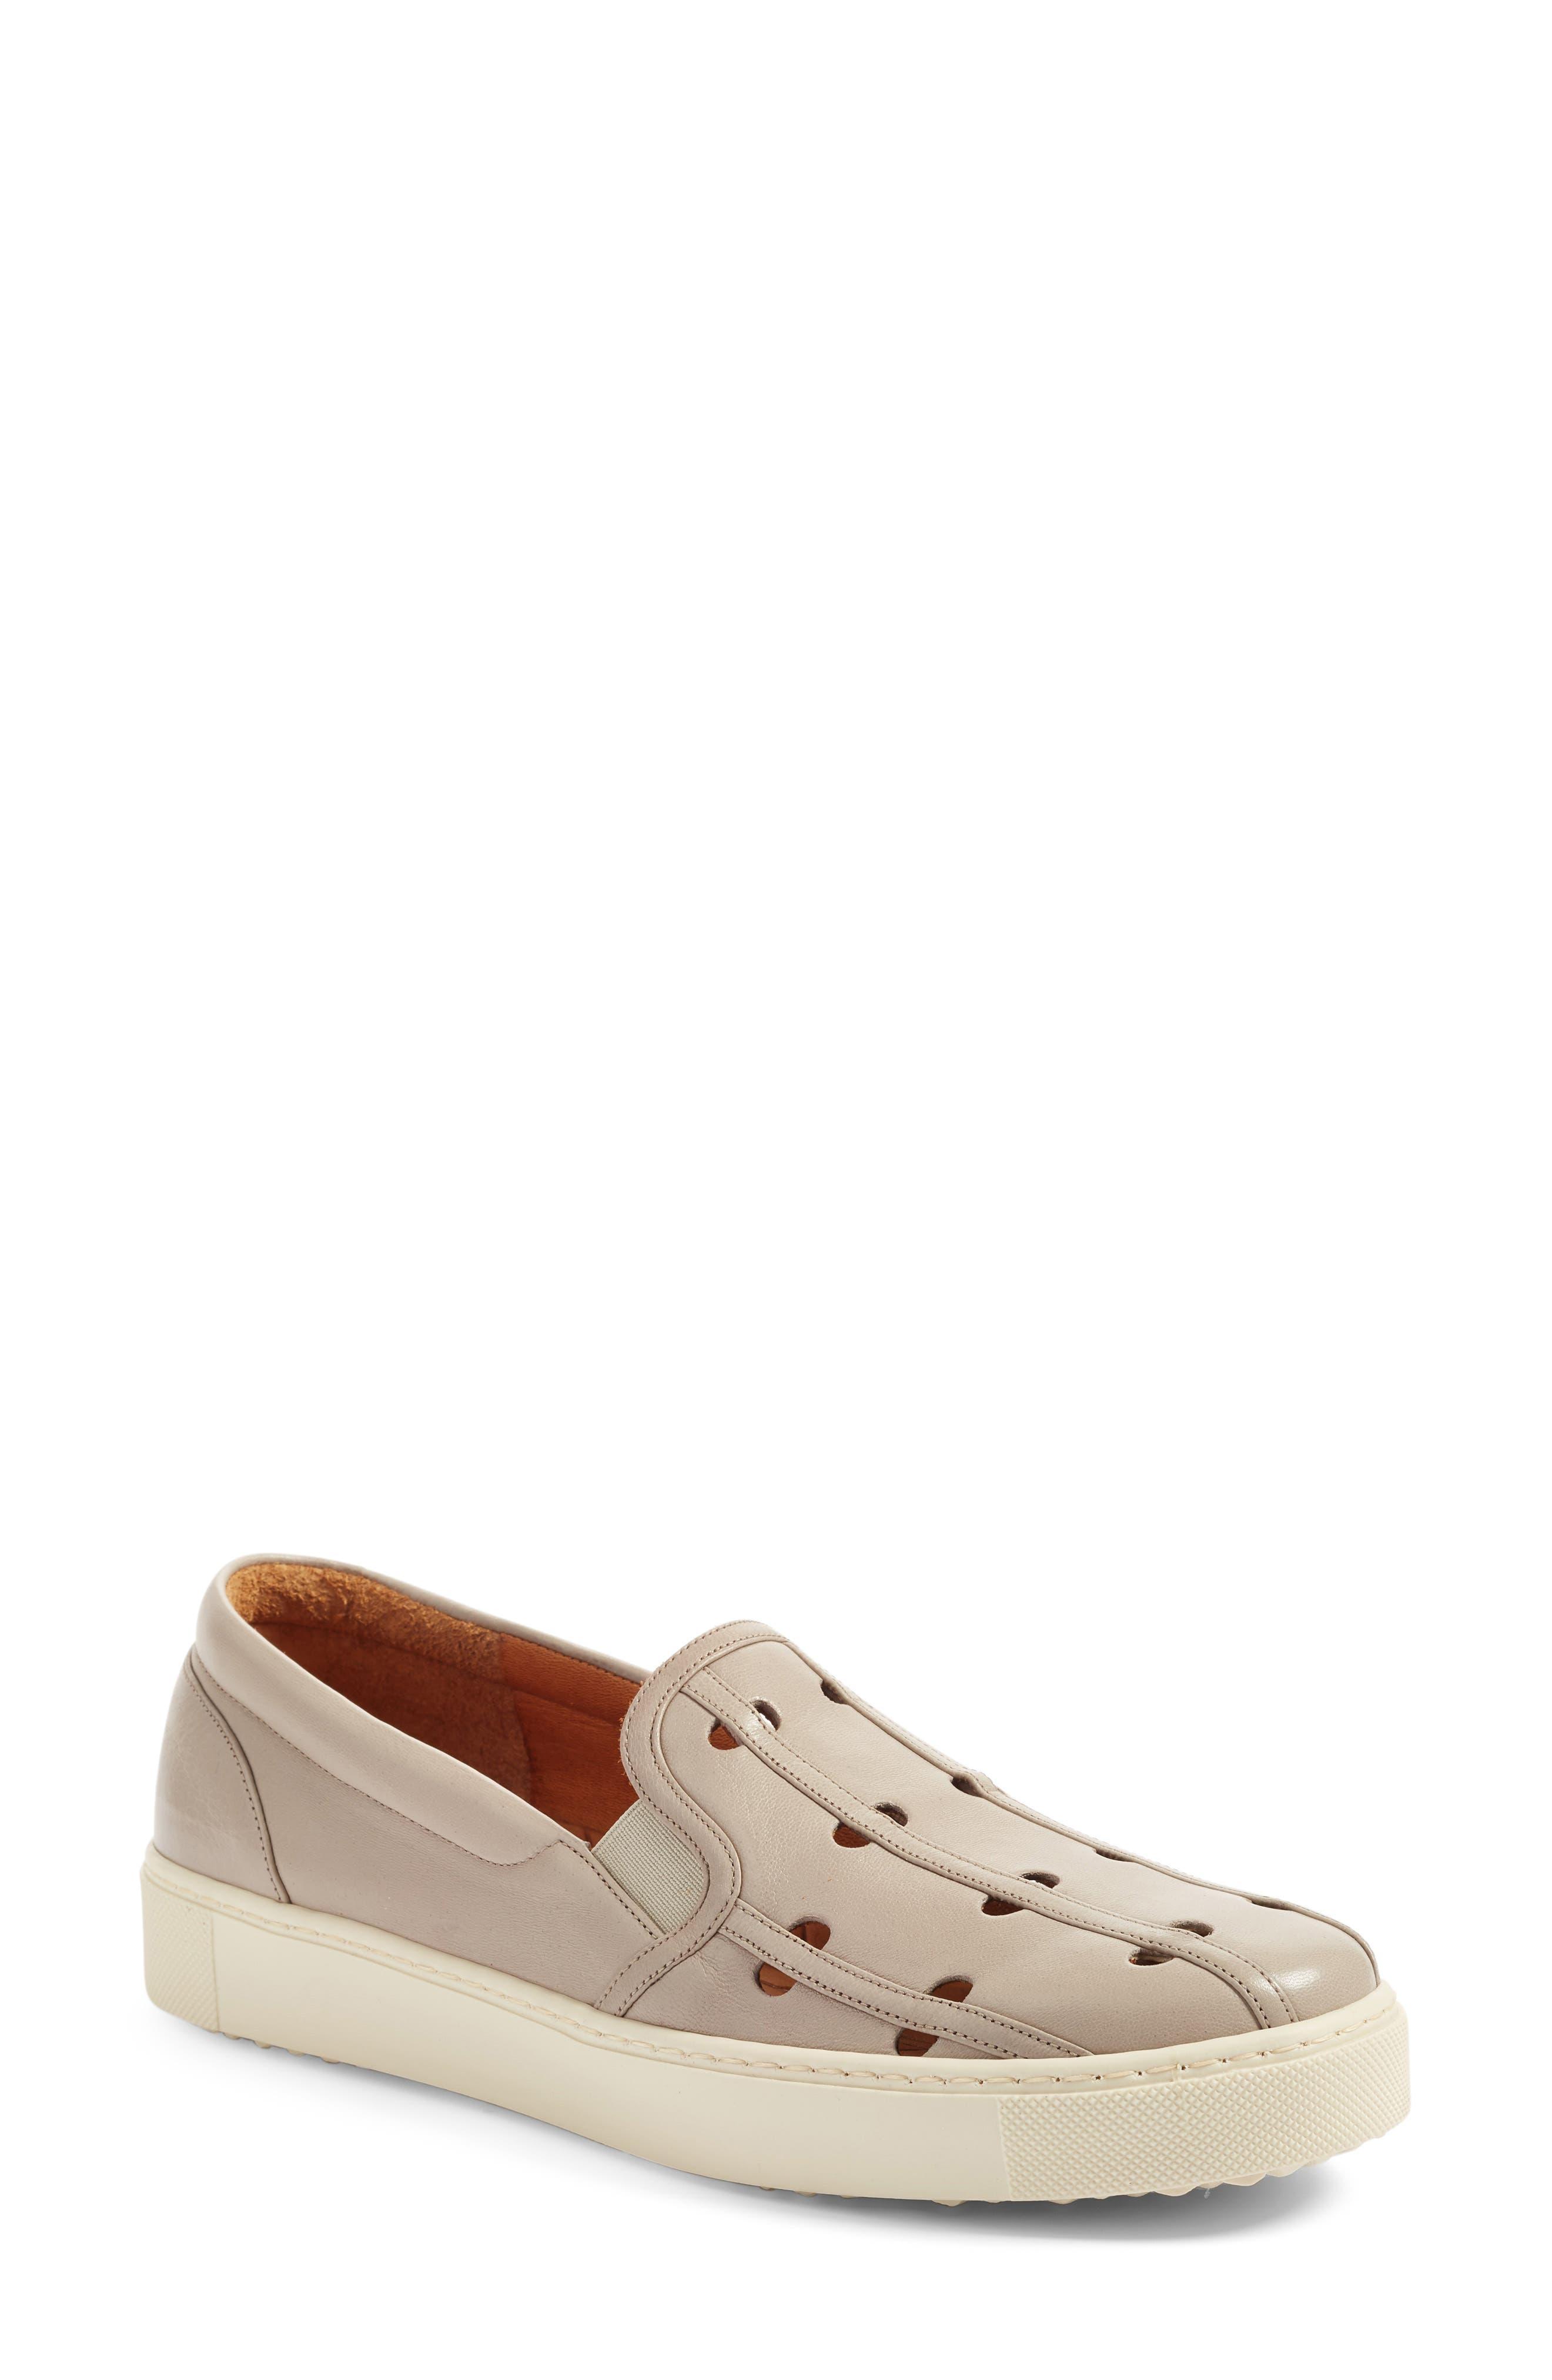 Zanca Slip-On Sneaker,                             Main thumbnail 1, color,                             020